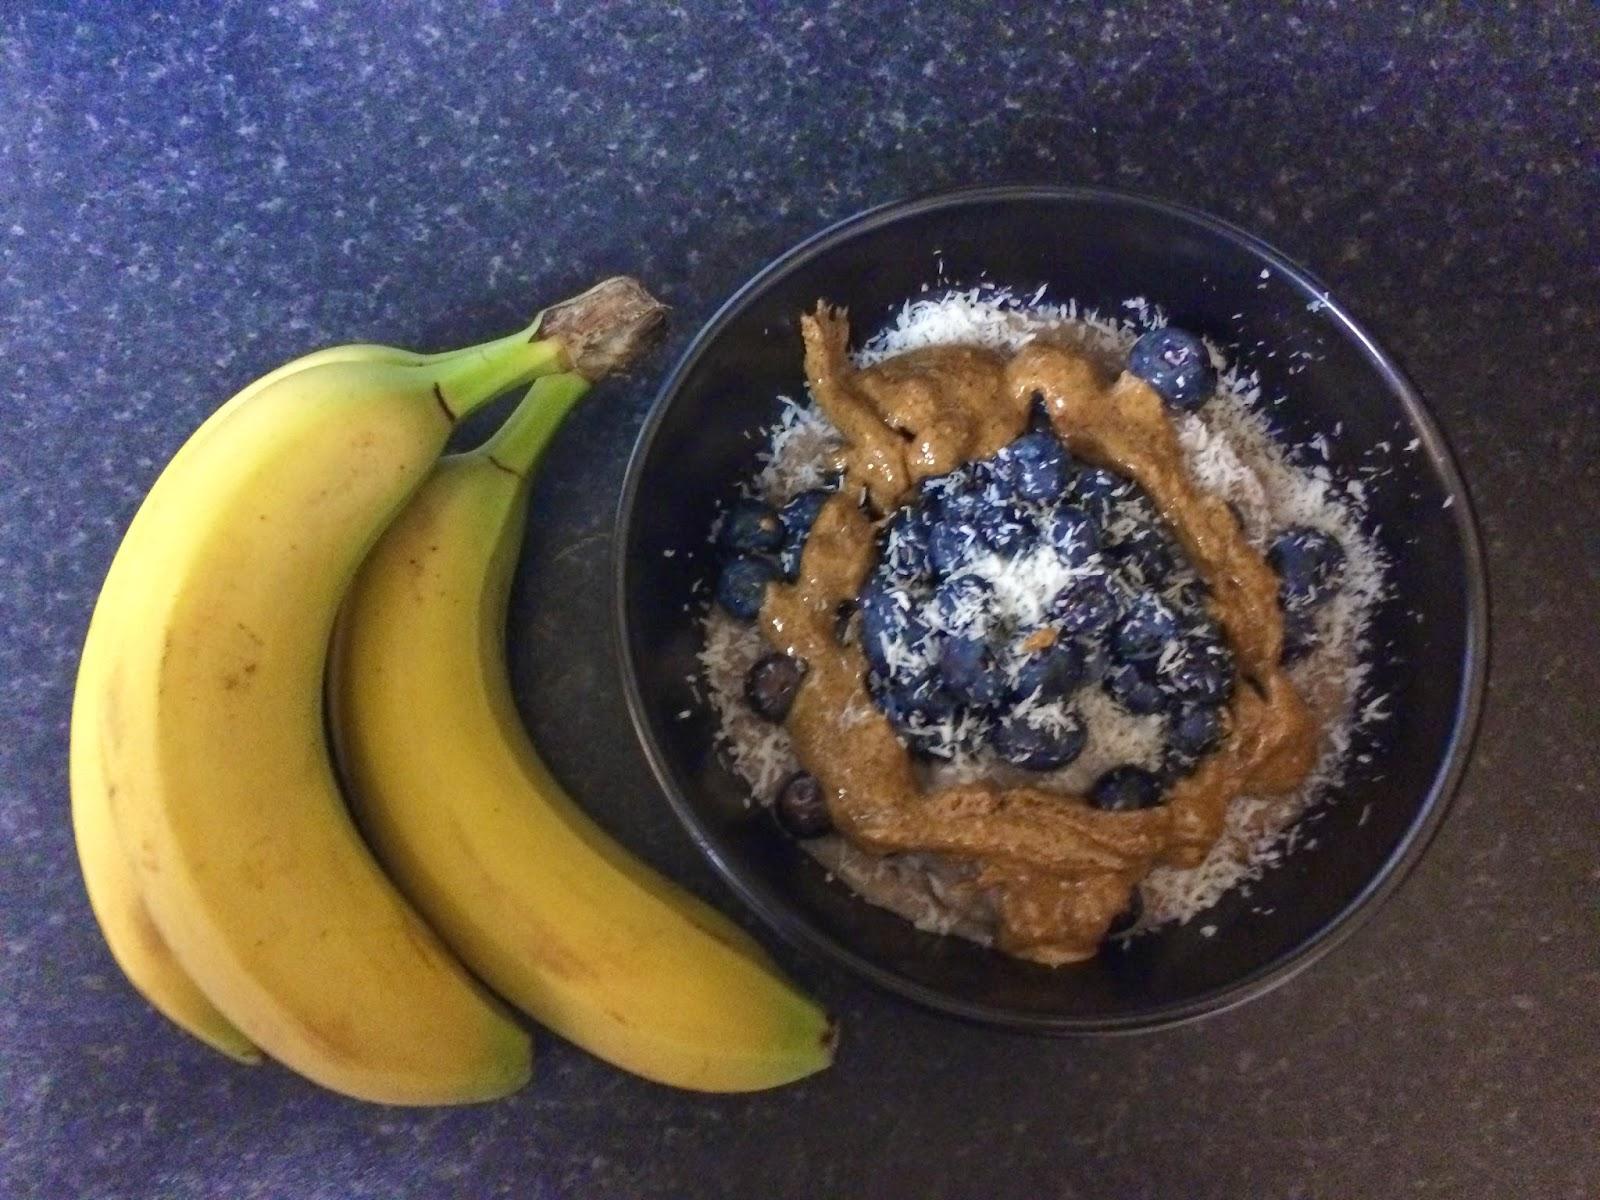 Jamaican Spiced Green Banana / Plantain Porridge